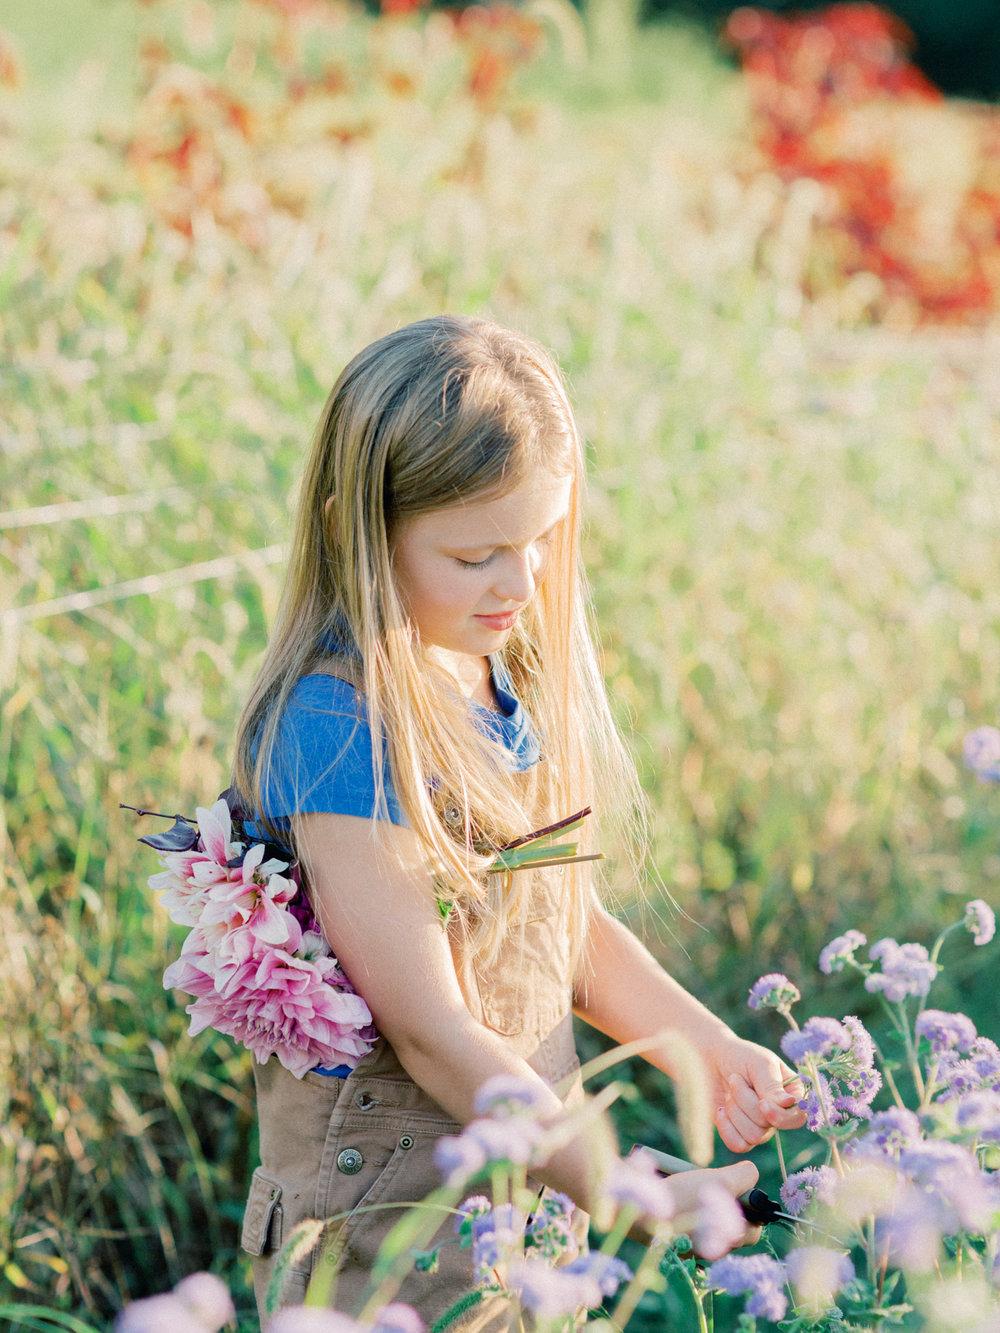 goosecreek-gardens-pittsburgh-florist-pittsburgh-family-photographer-anna-laero-photography-wedding-flowers-pittsburgh-pa-16.jpg